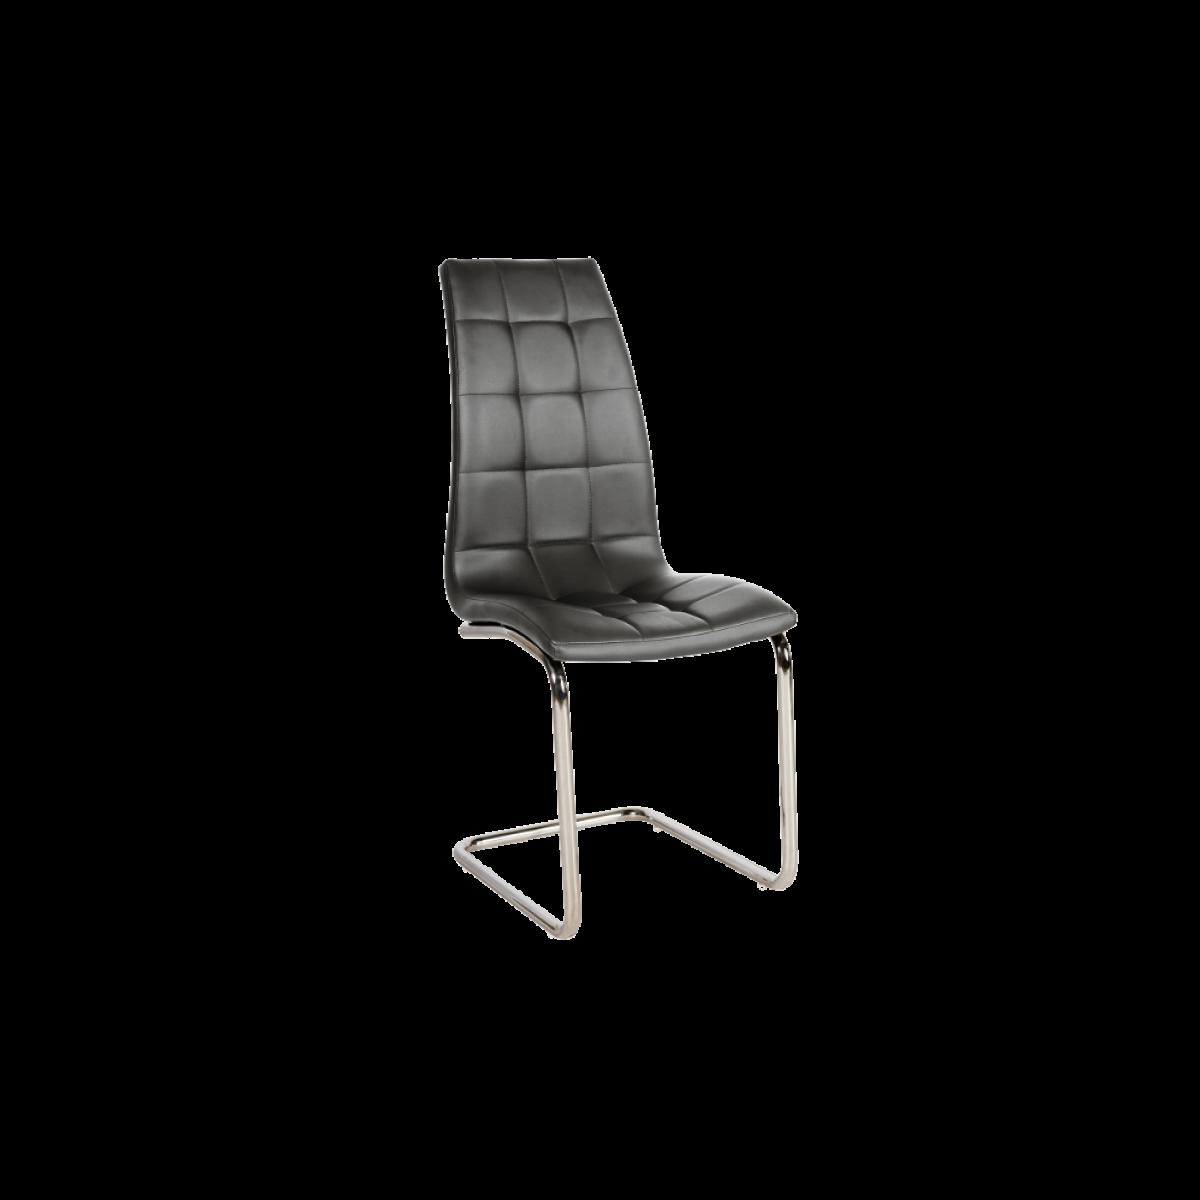 Ac-Deco Chaise en cuir PU - H103 - 43 x 42 x 102 cm - Gris